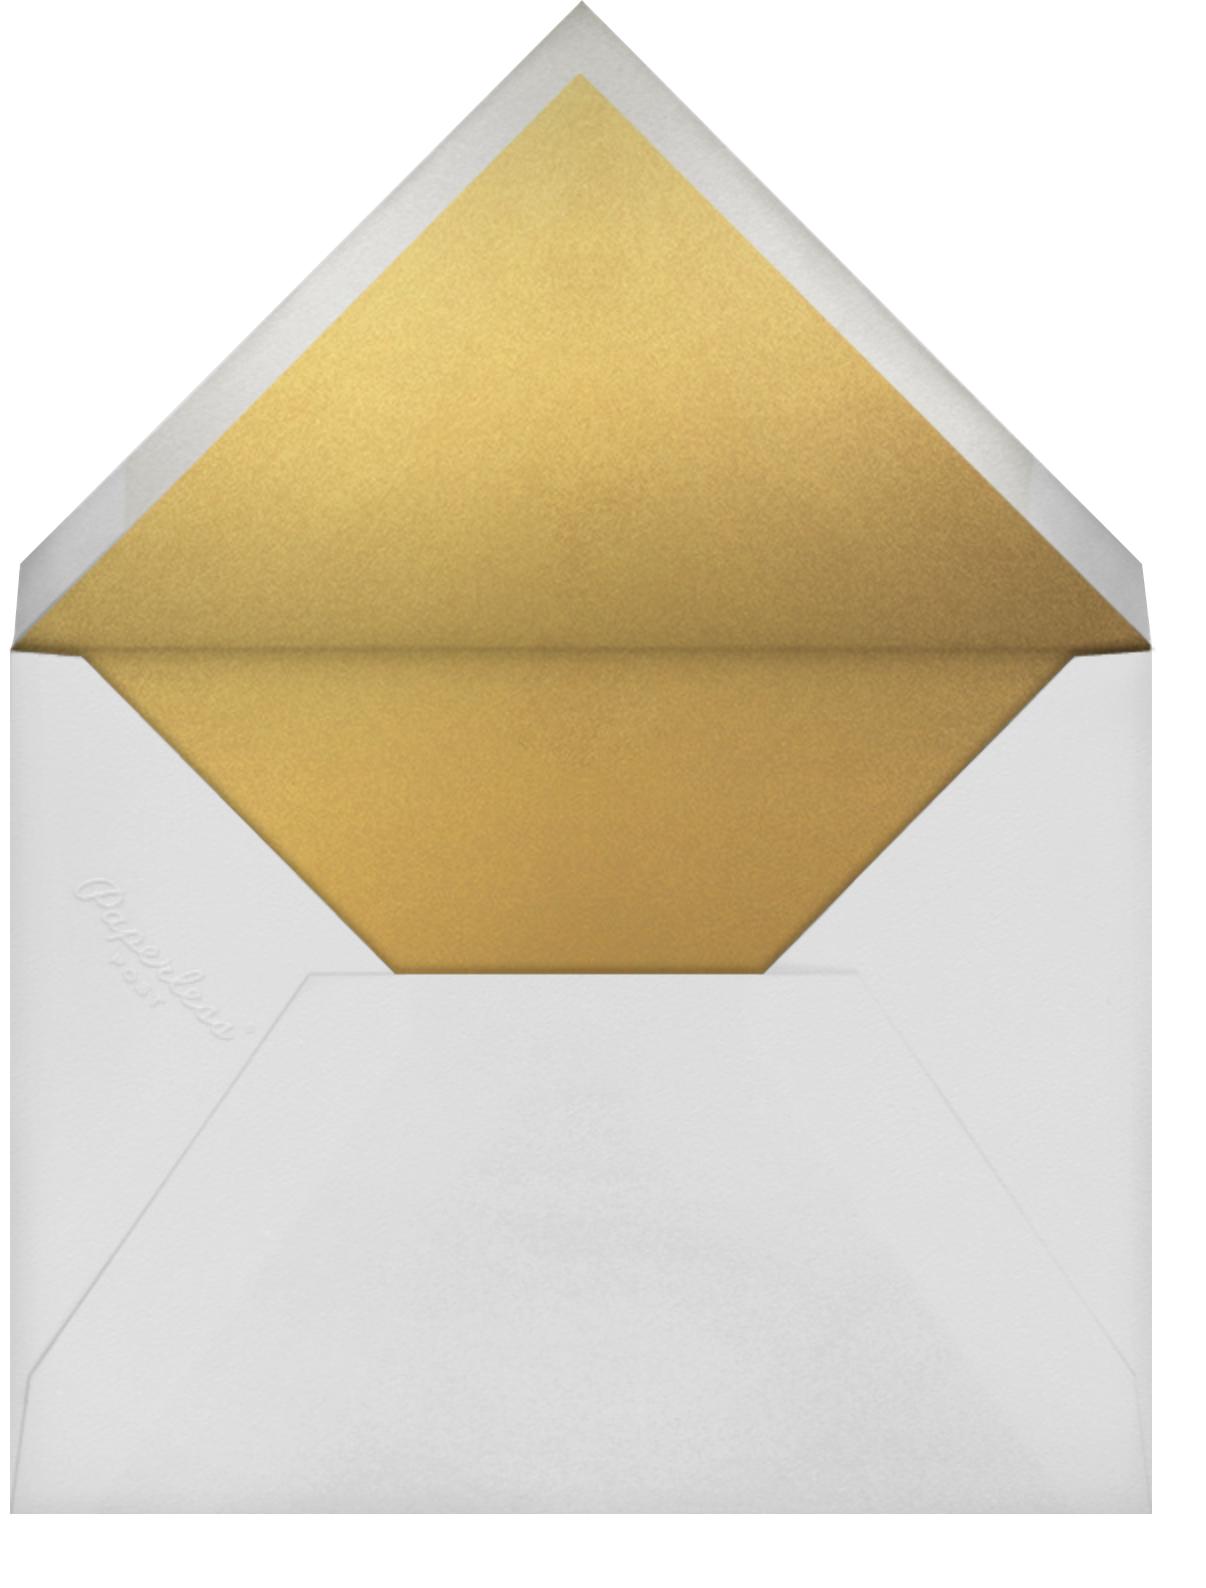 Grenadine - Crimson - Oscar de la Renta - Rosh Hashanah - envelope back